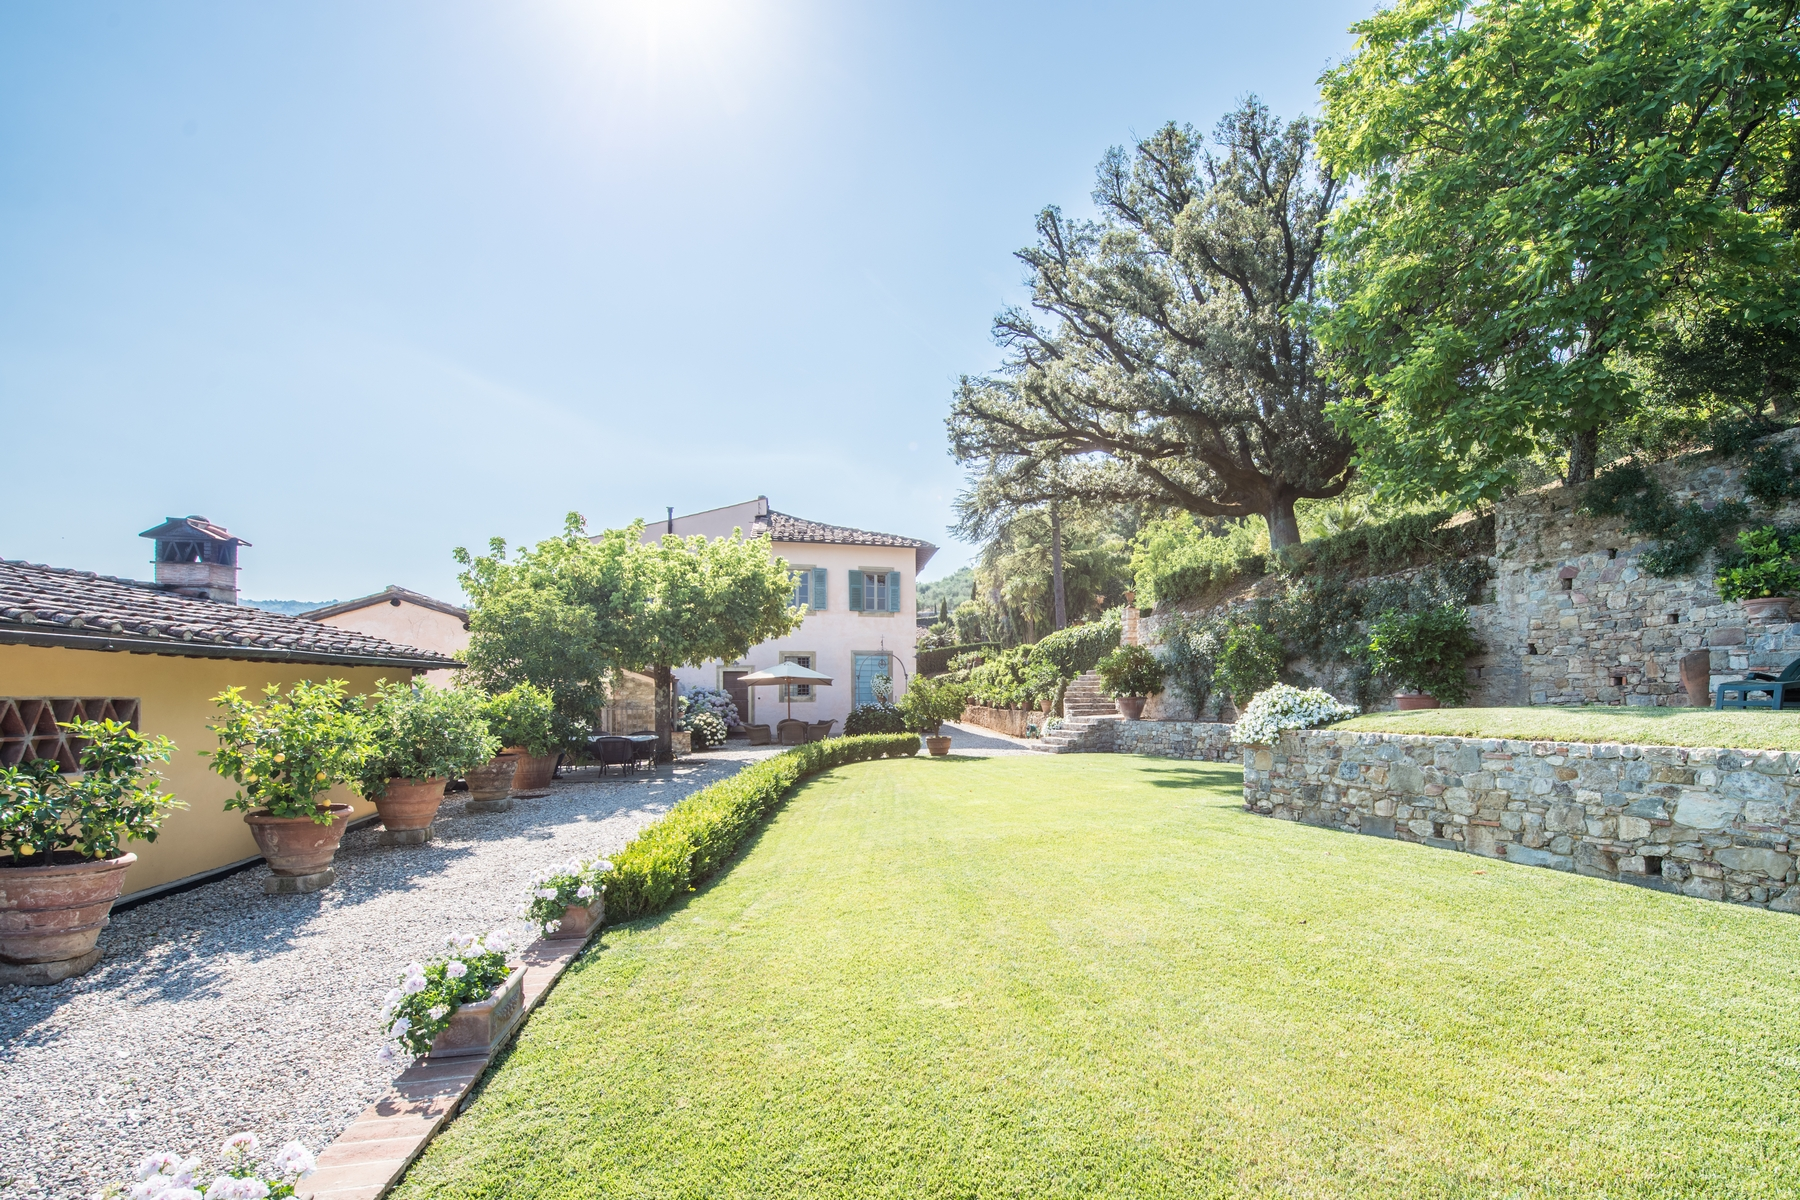 Villa in Vendita a Lucca: 5 locali, 2500 mq - Foto 18